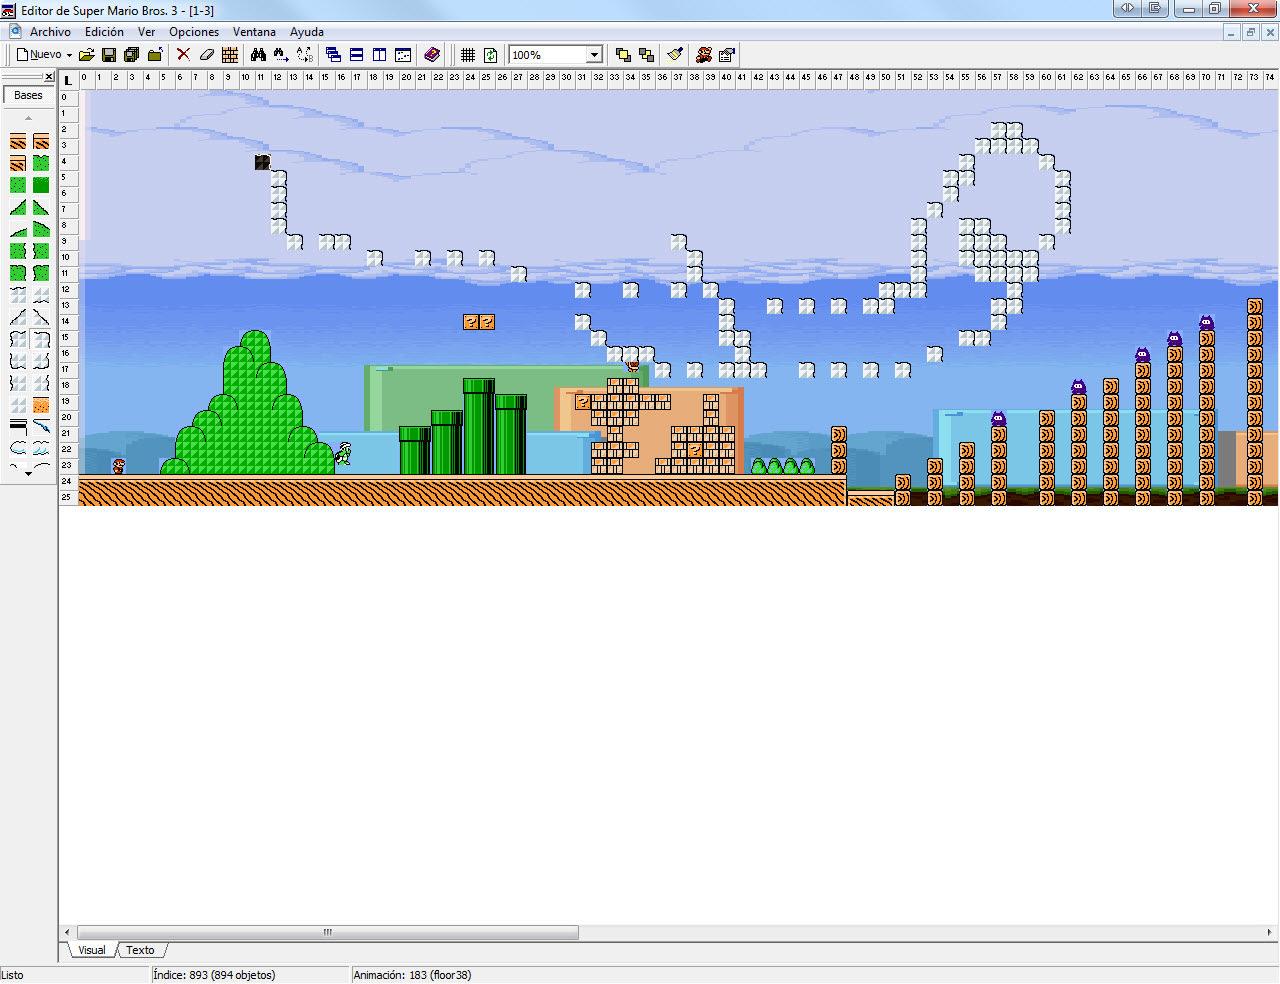 Editor de Niveles Super Mario